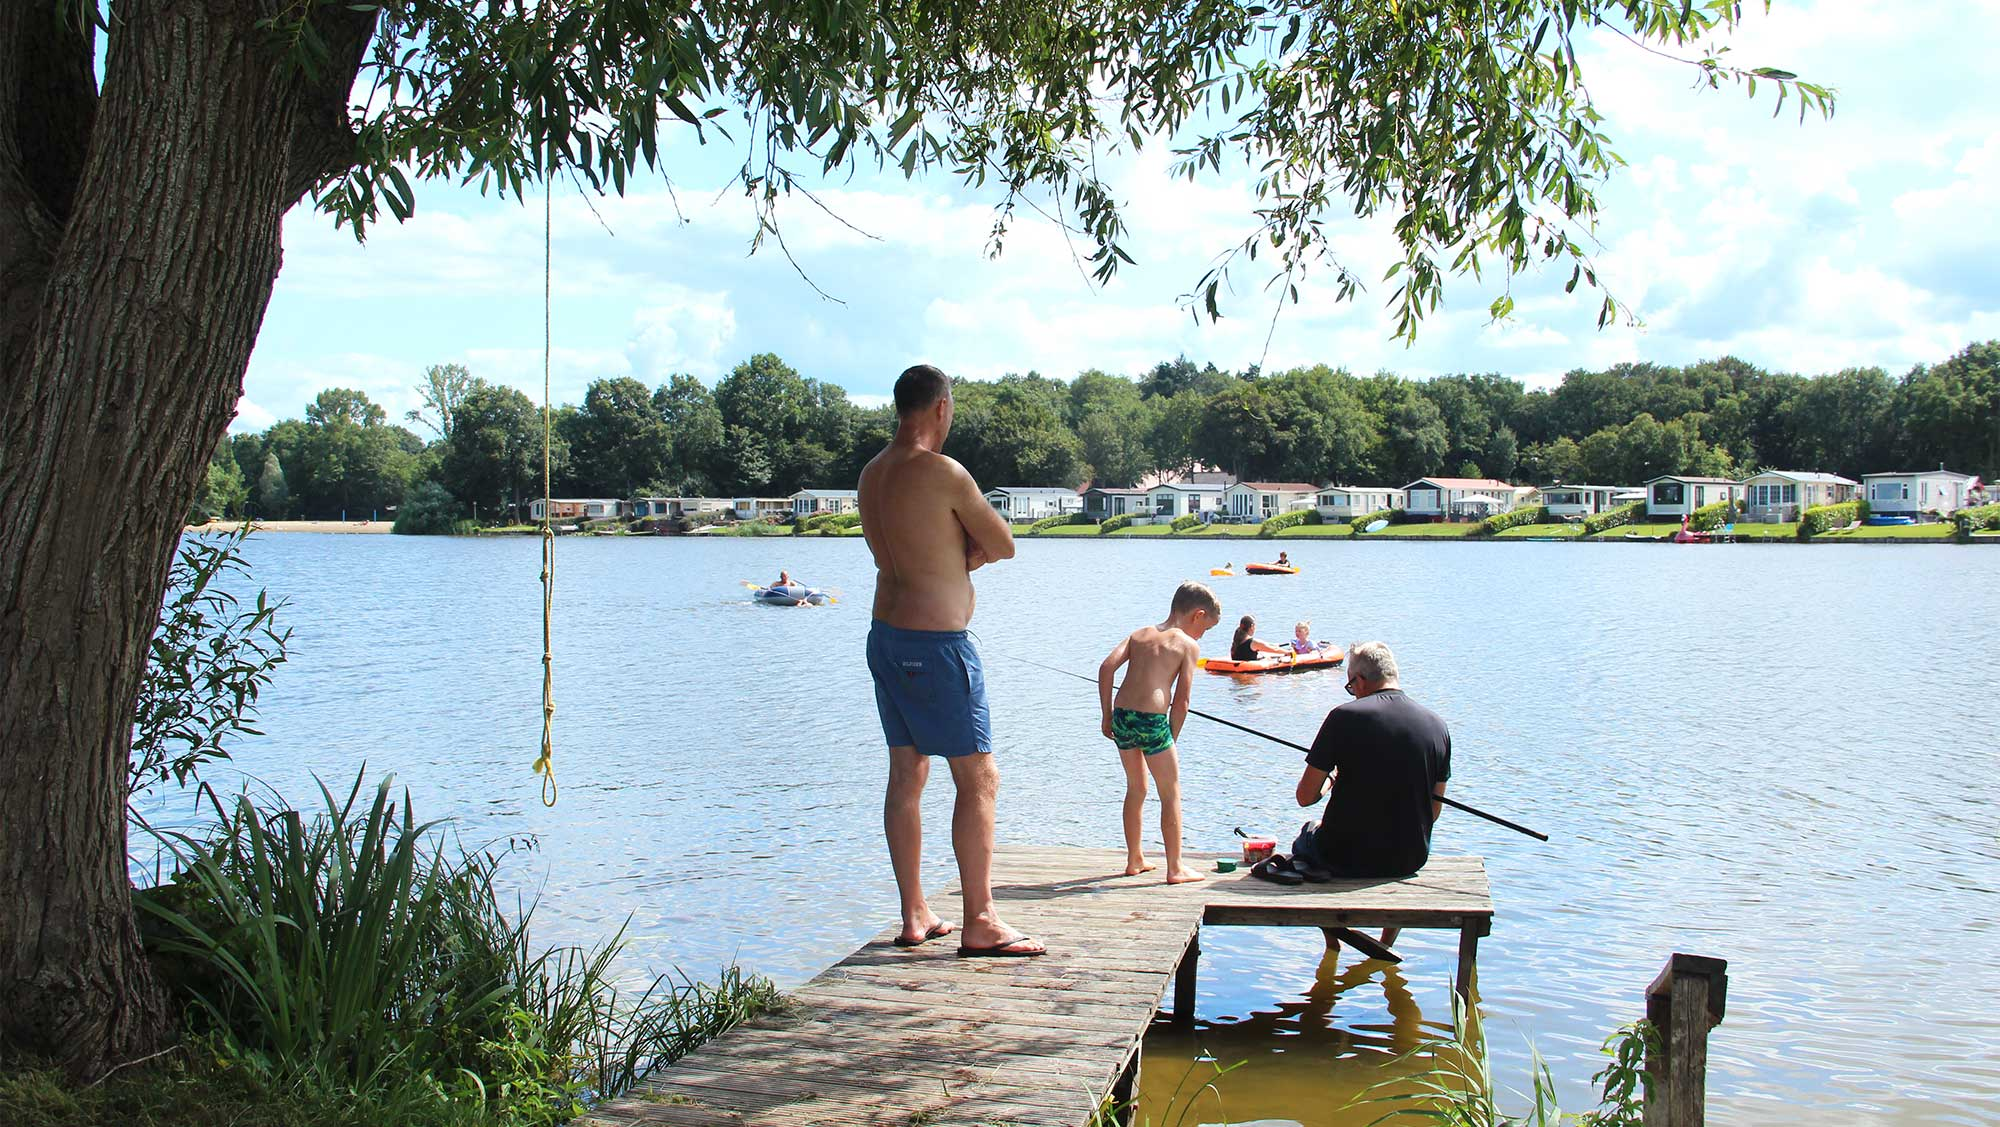 Molecaten Park De Agnietenberg 07 Agnietenplas